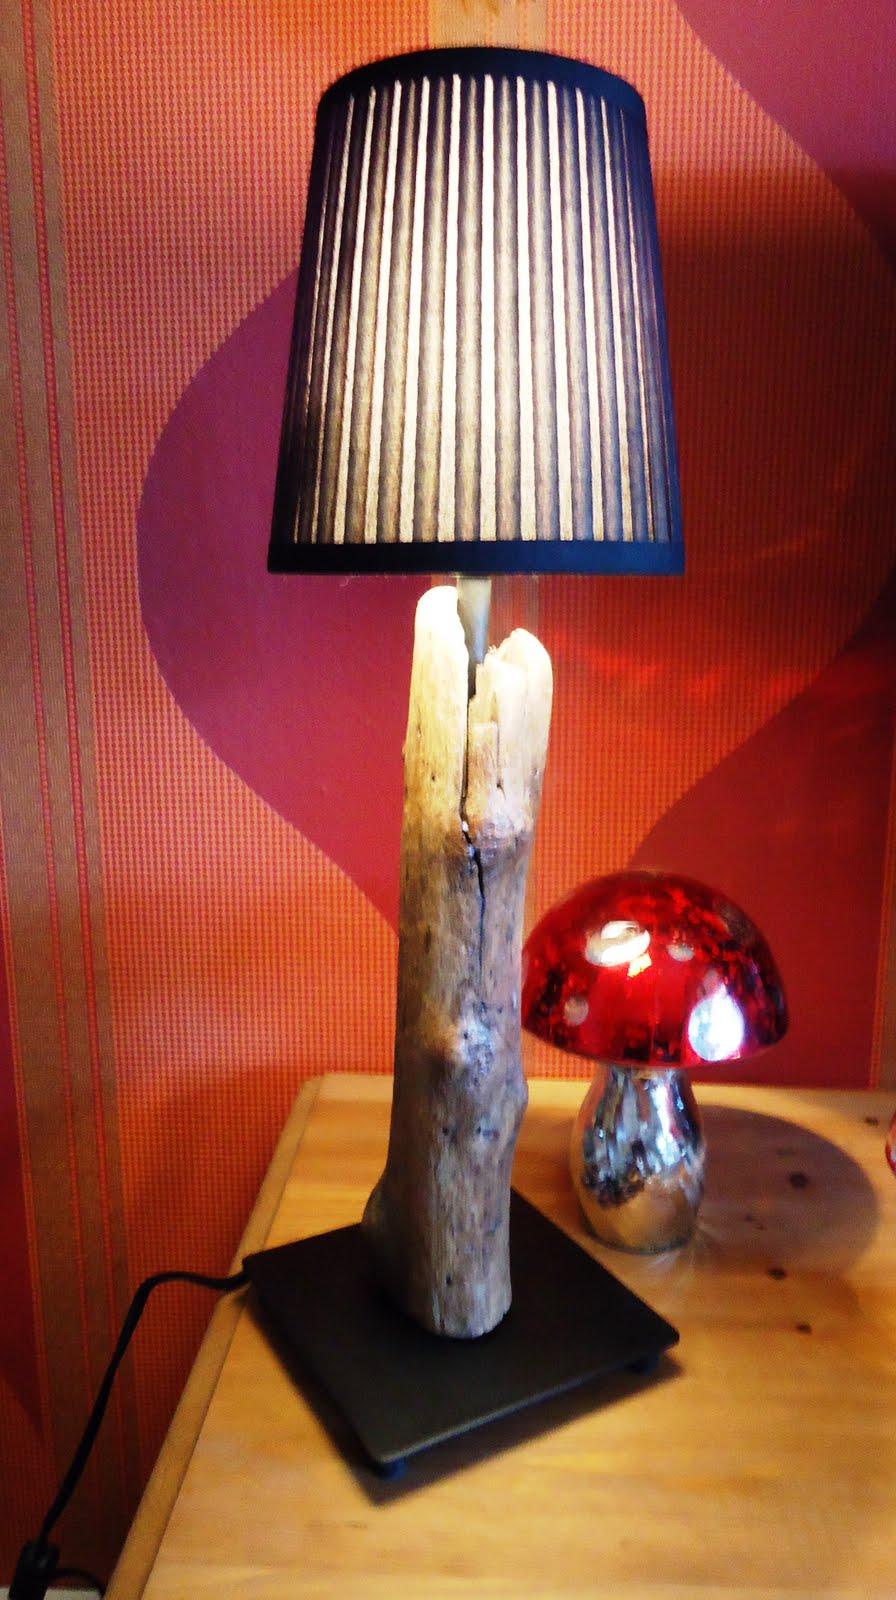 fembria art lampen und leuchten aus treibholz lamps and. Black Bedroom Furniture Sets. Home Design Ideas